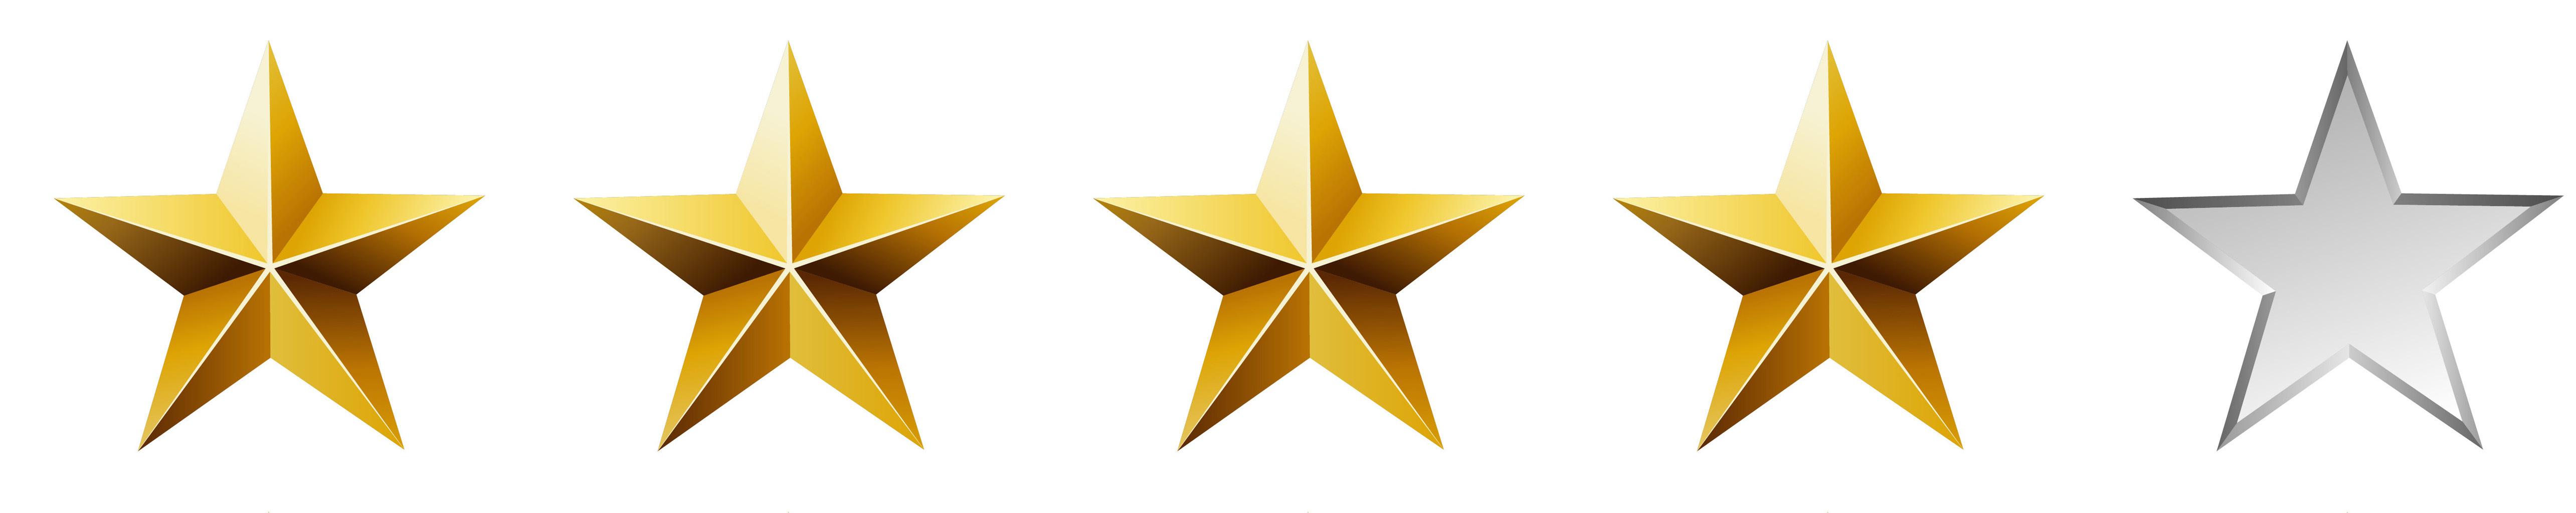 Image result for 4/5 stars